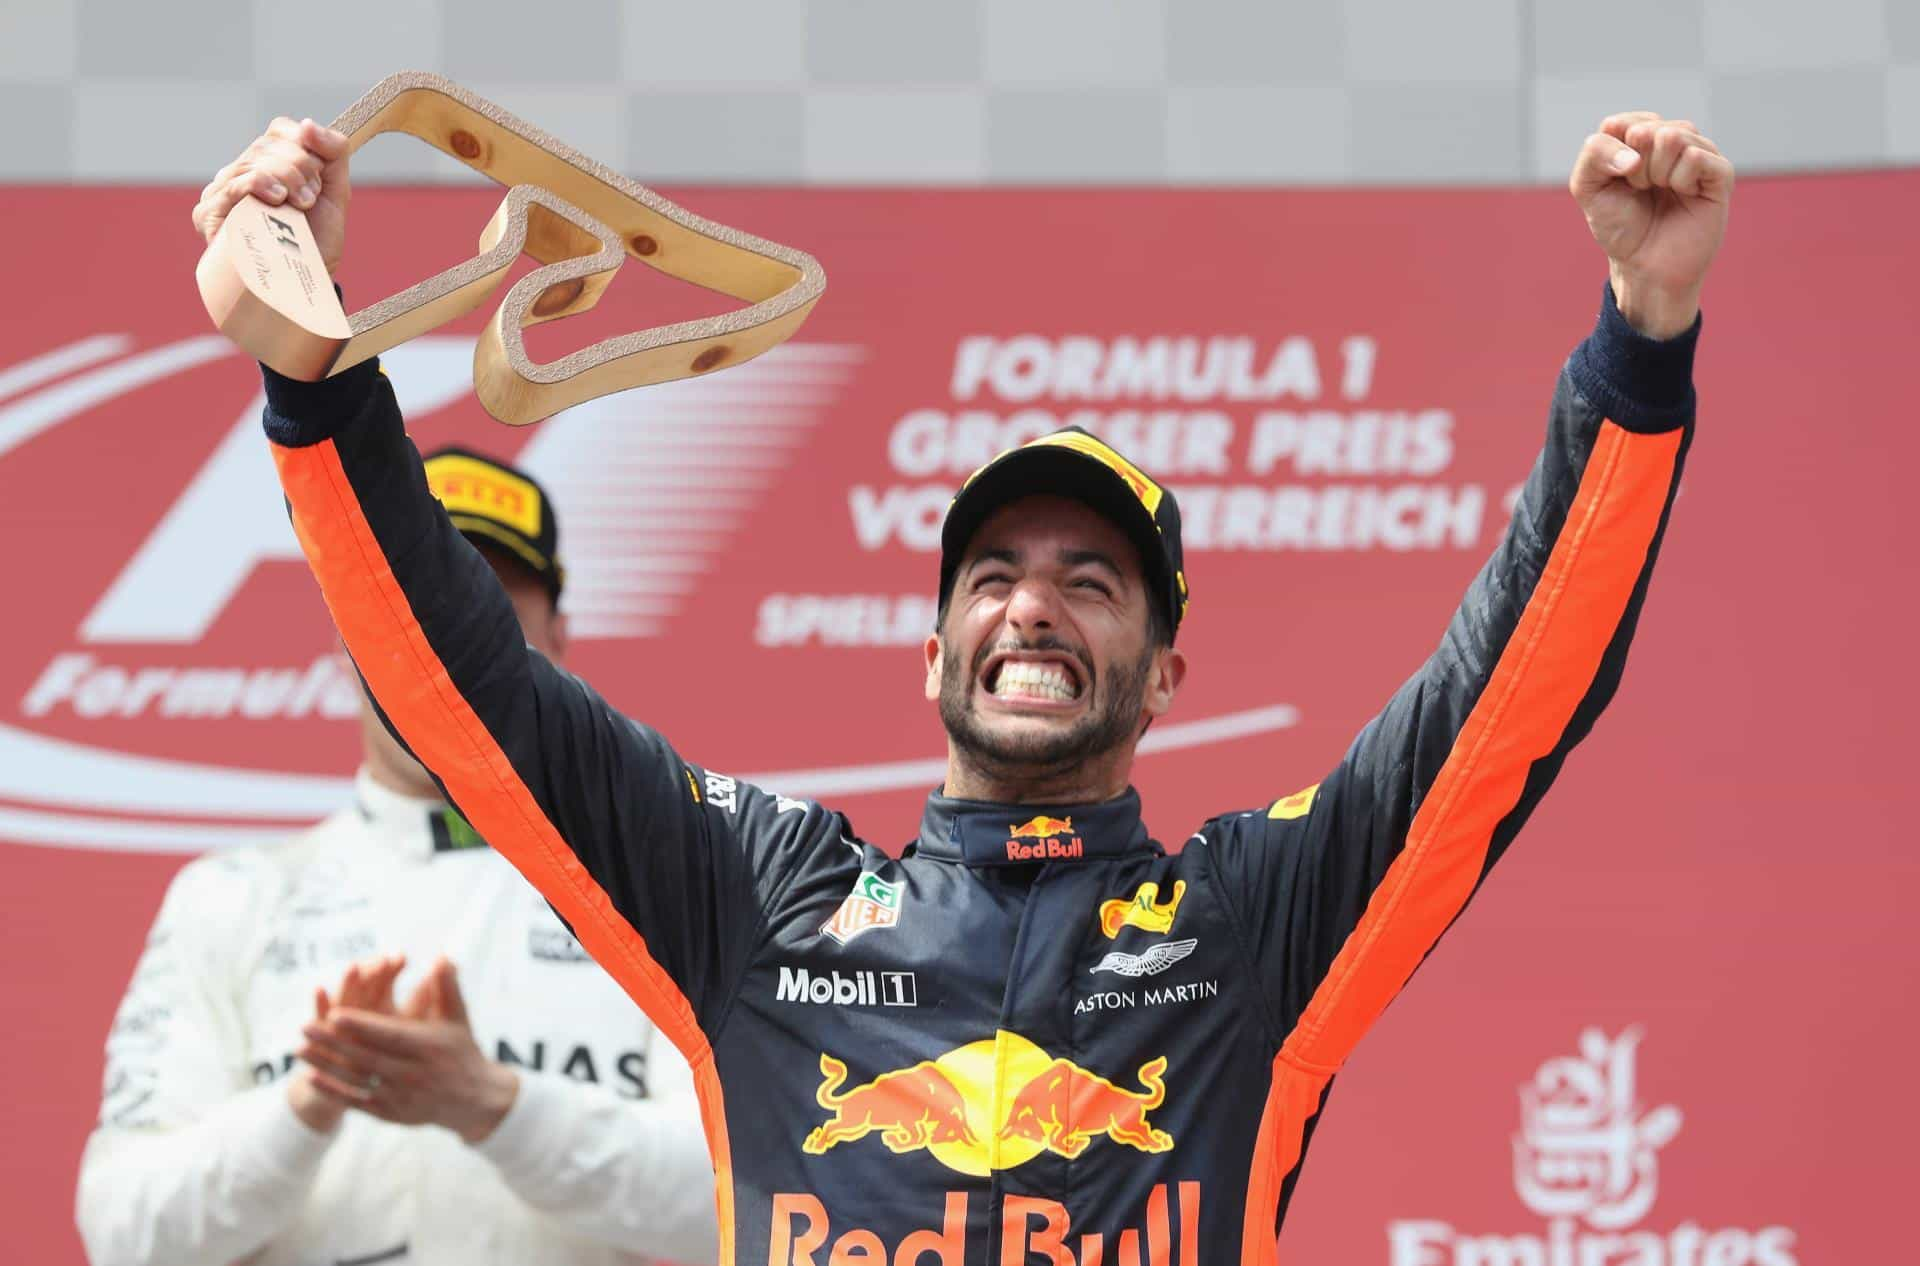 Ricciardo Austrian GP F1 2017 podium Photo Red Bull